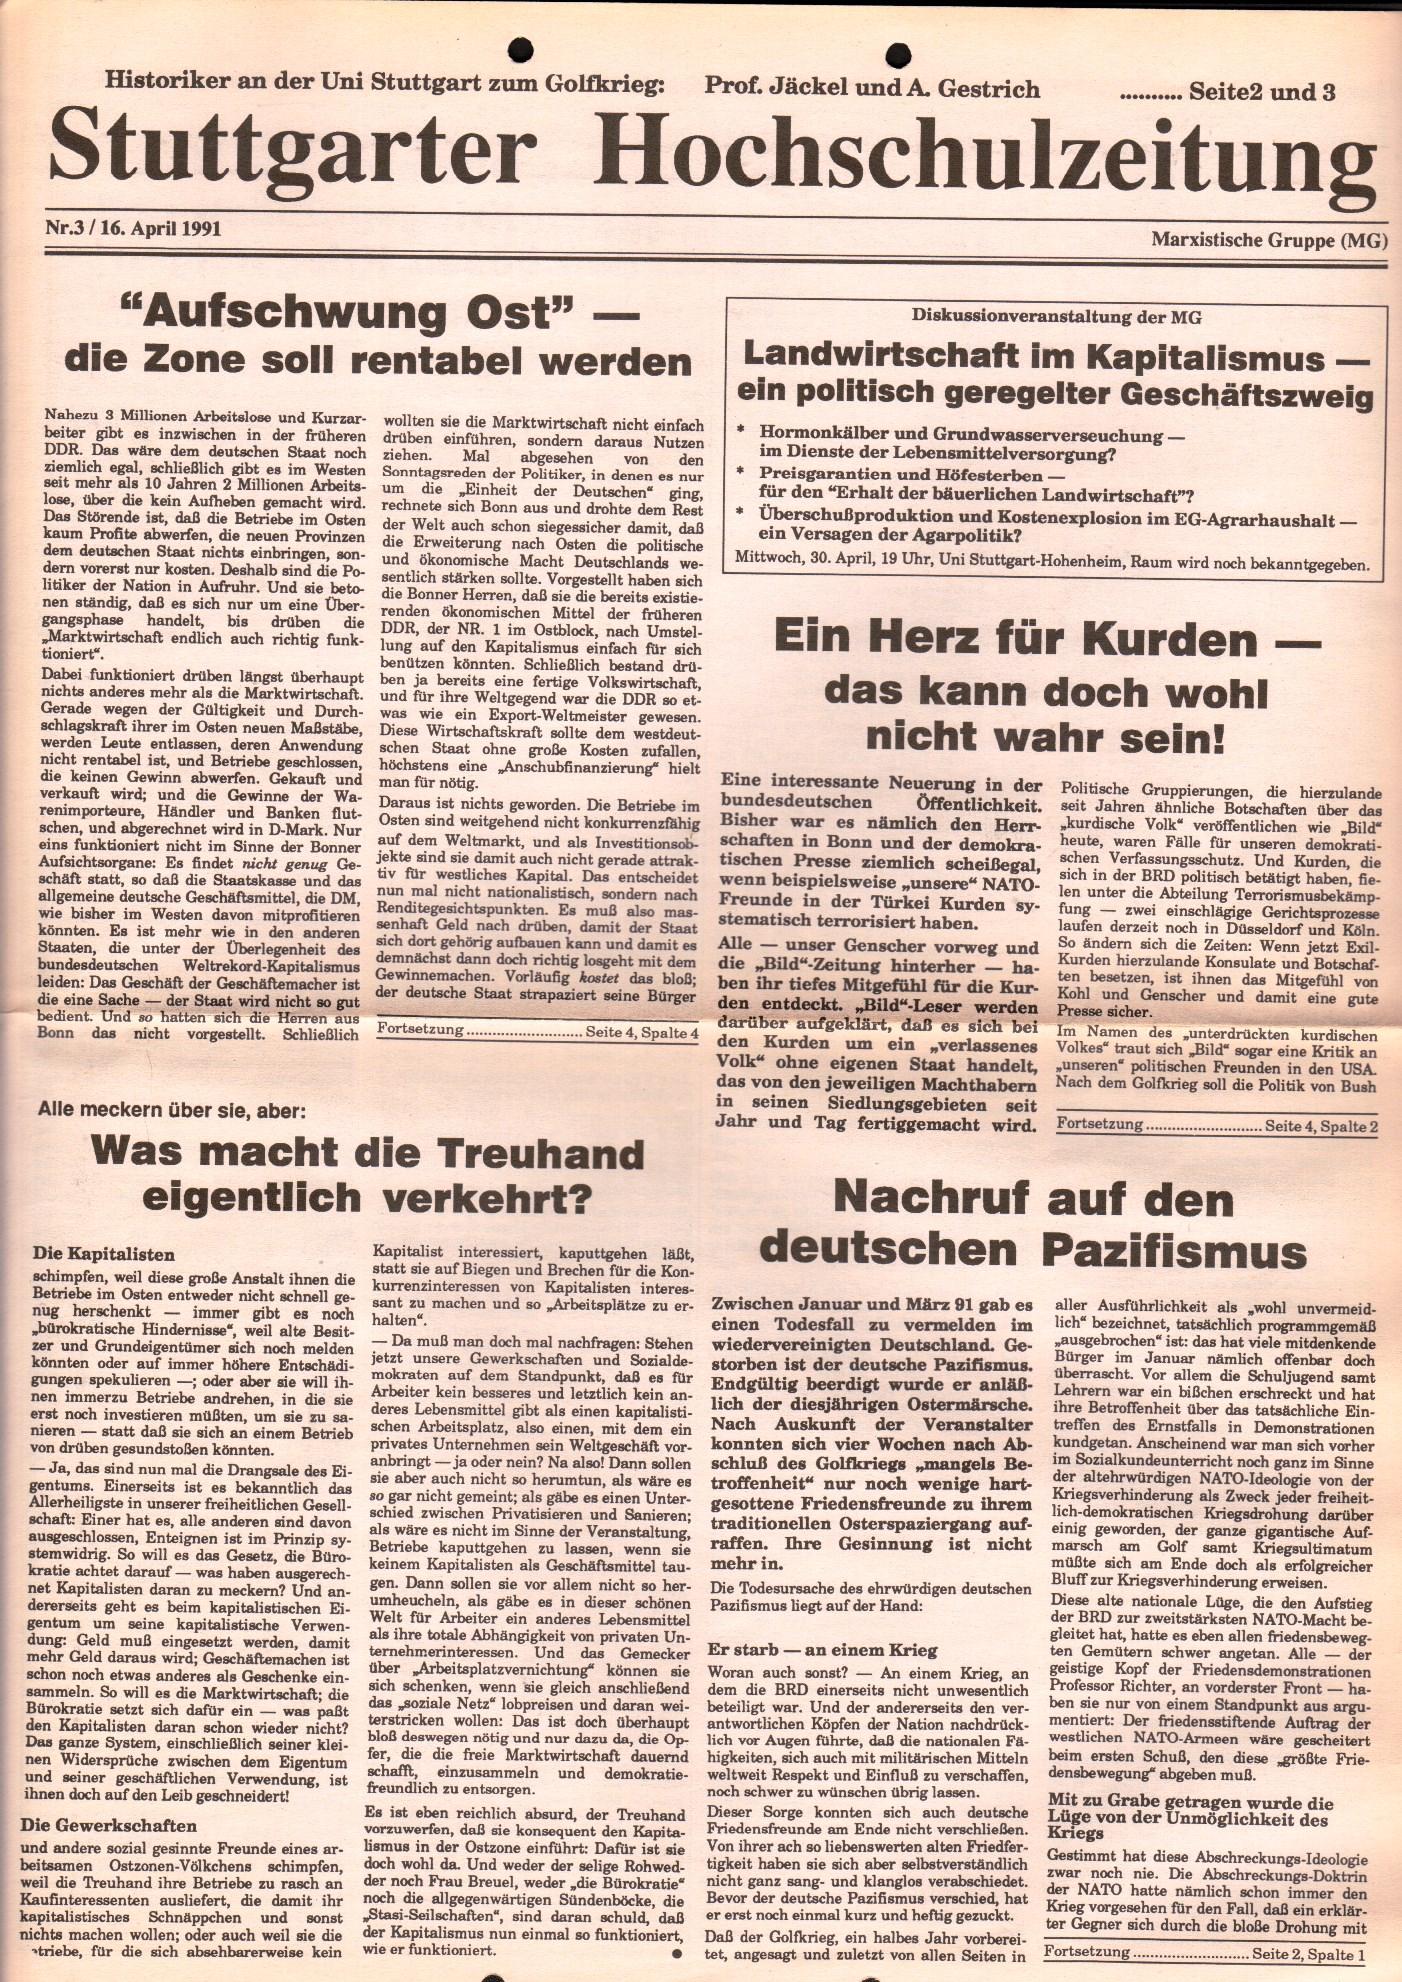 Stuttgart_MG_Hochschulzeitung_1991_03_01